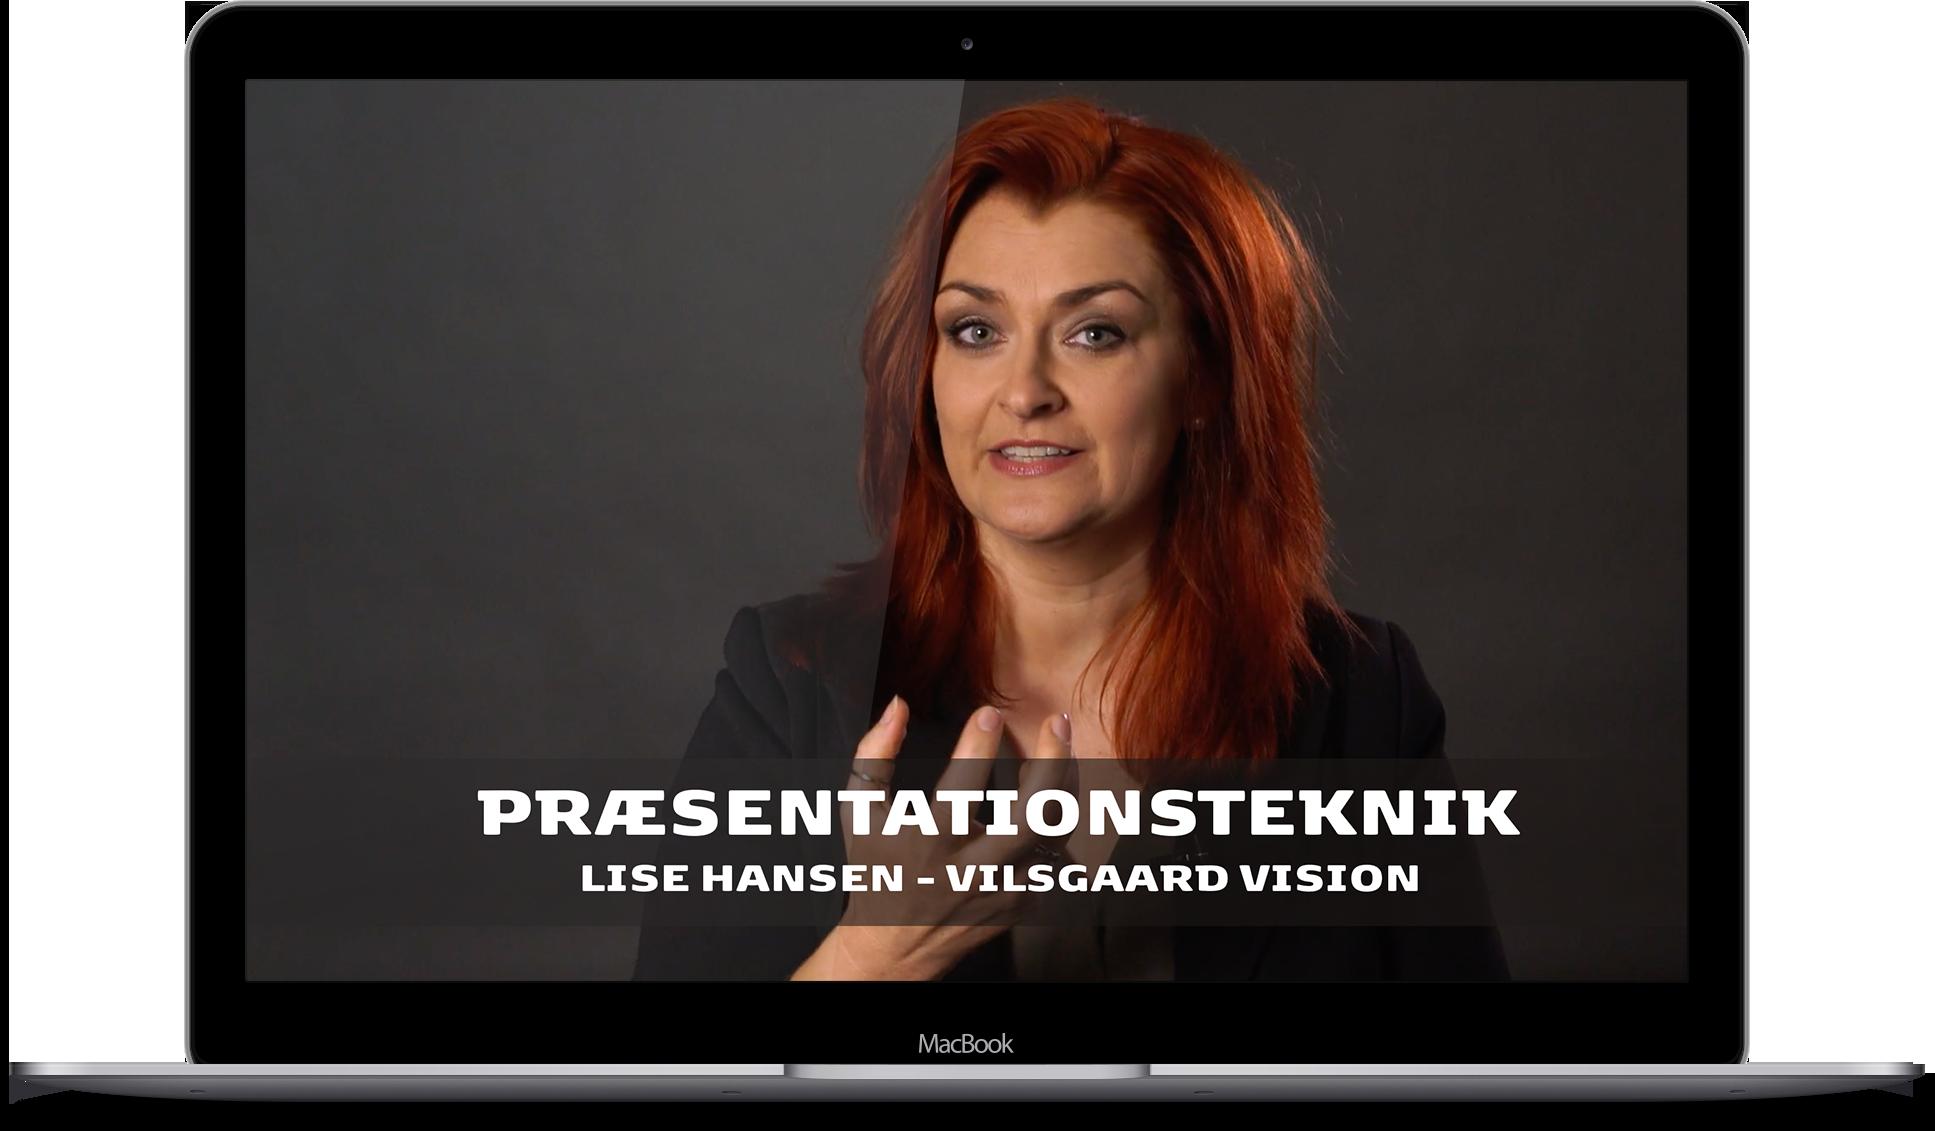 presentationsteknik.png